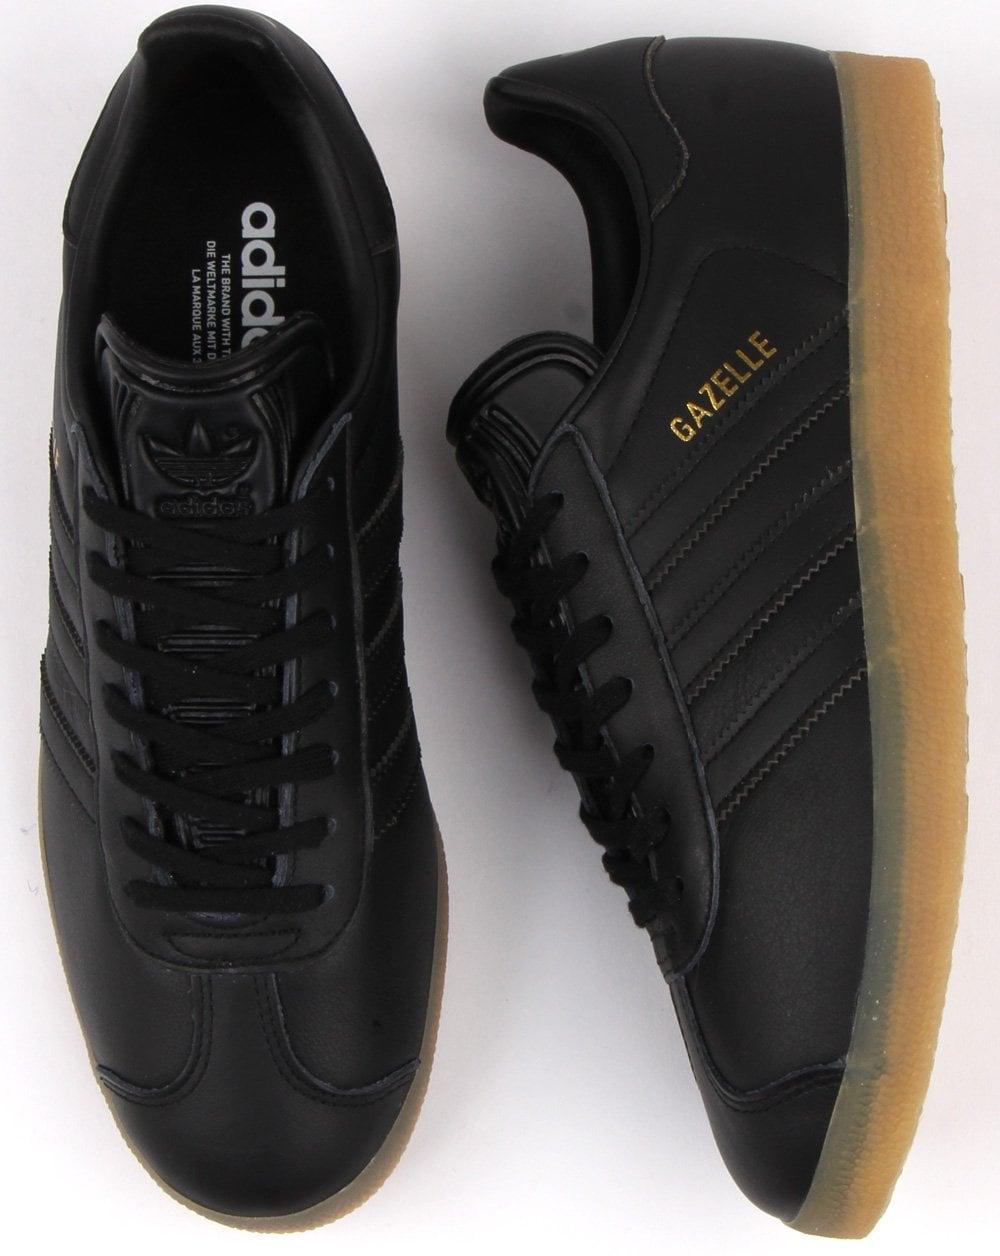 Adidas, Gazelle, Trainers, Black